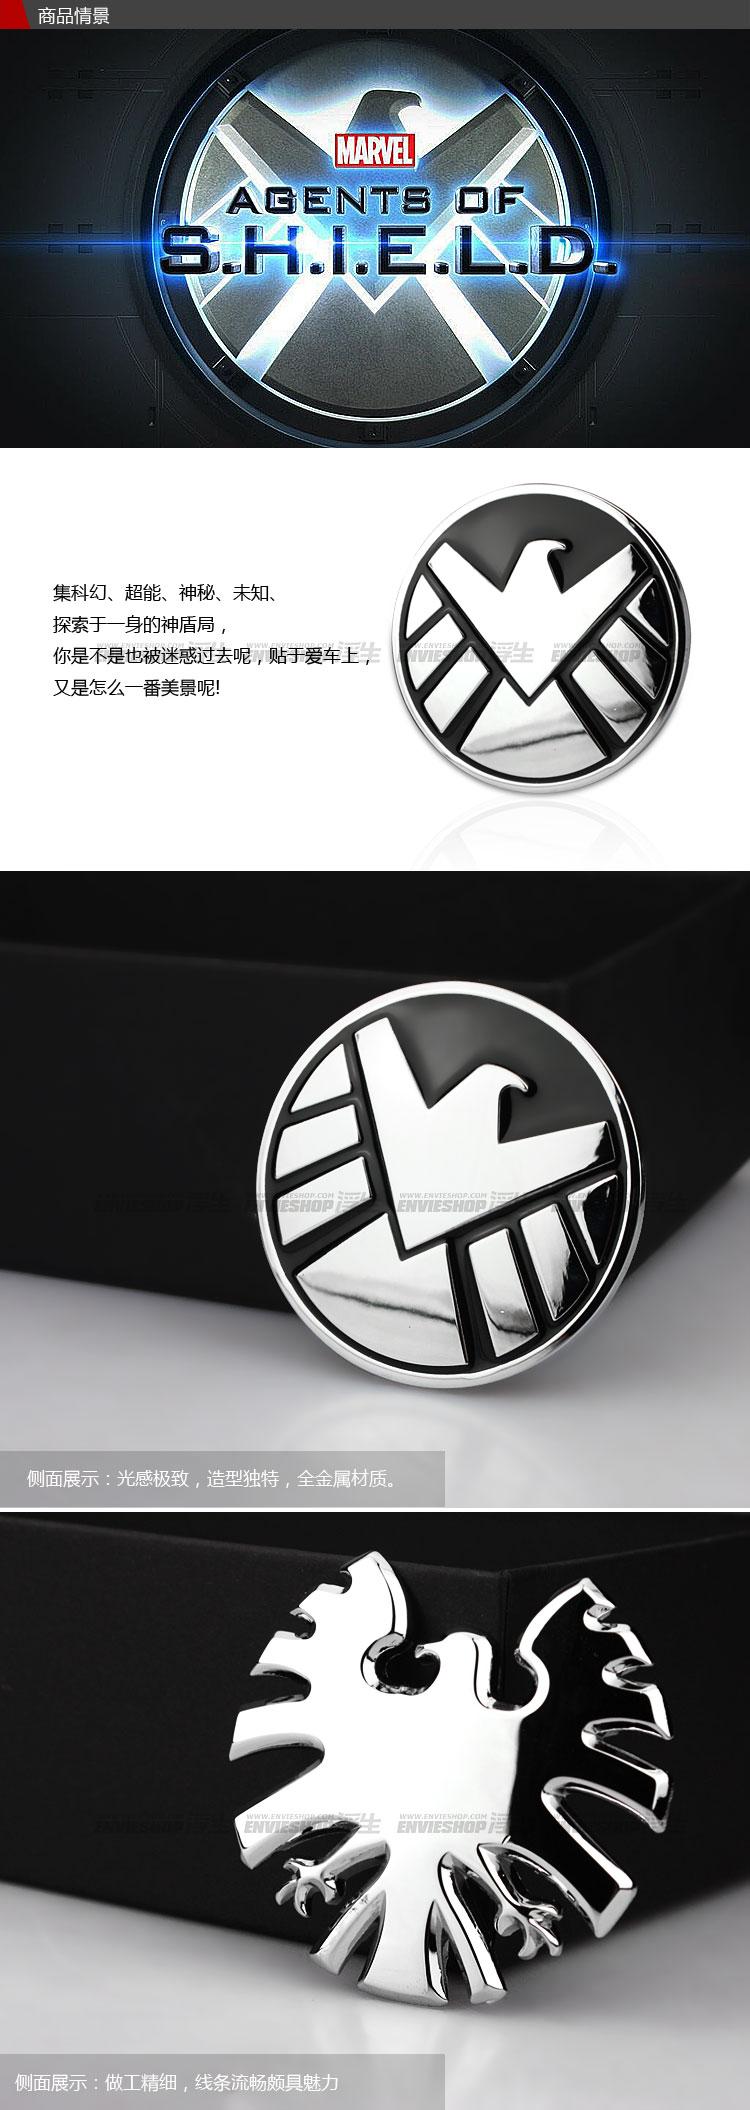 Design car emblem -  The Avengers Agents Of Shield Design Metal Car Emblem Badge 3d Car Decor Styling